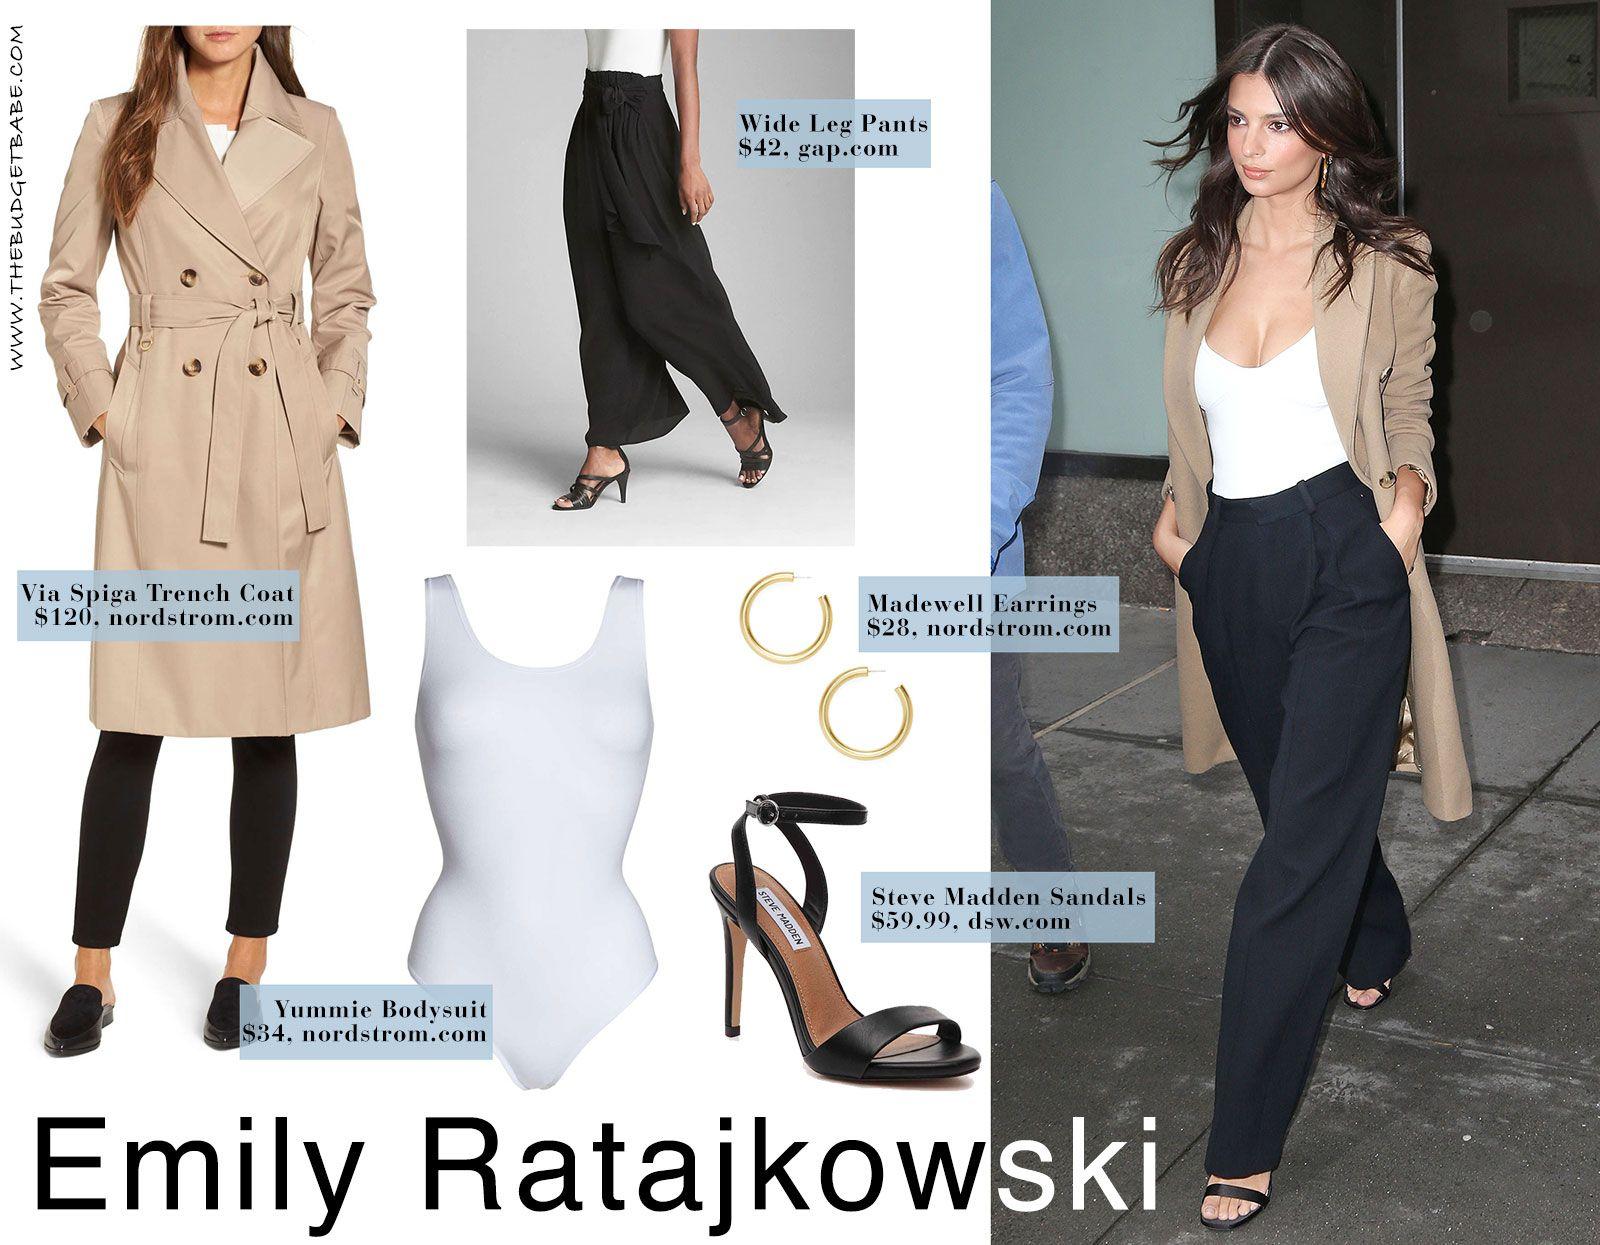 57632a753681c Emily Ratajkowski s White Bodysuit and High-Waisted Pants - The Budget Babe